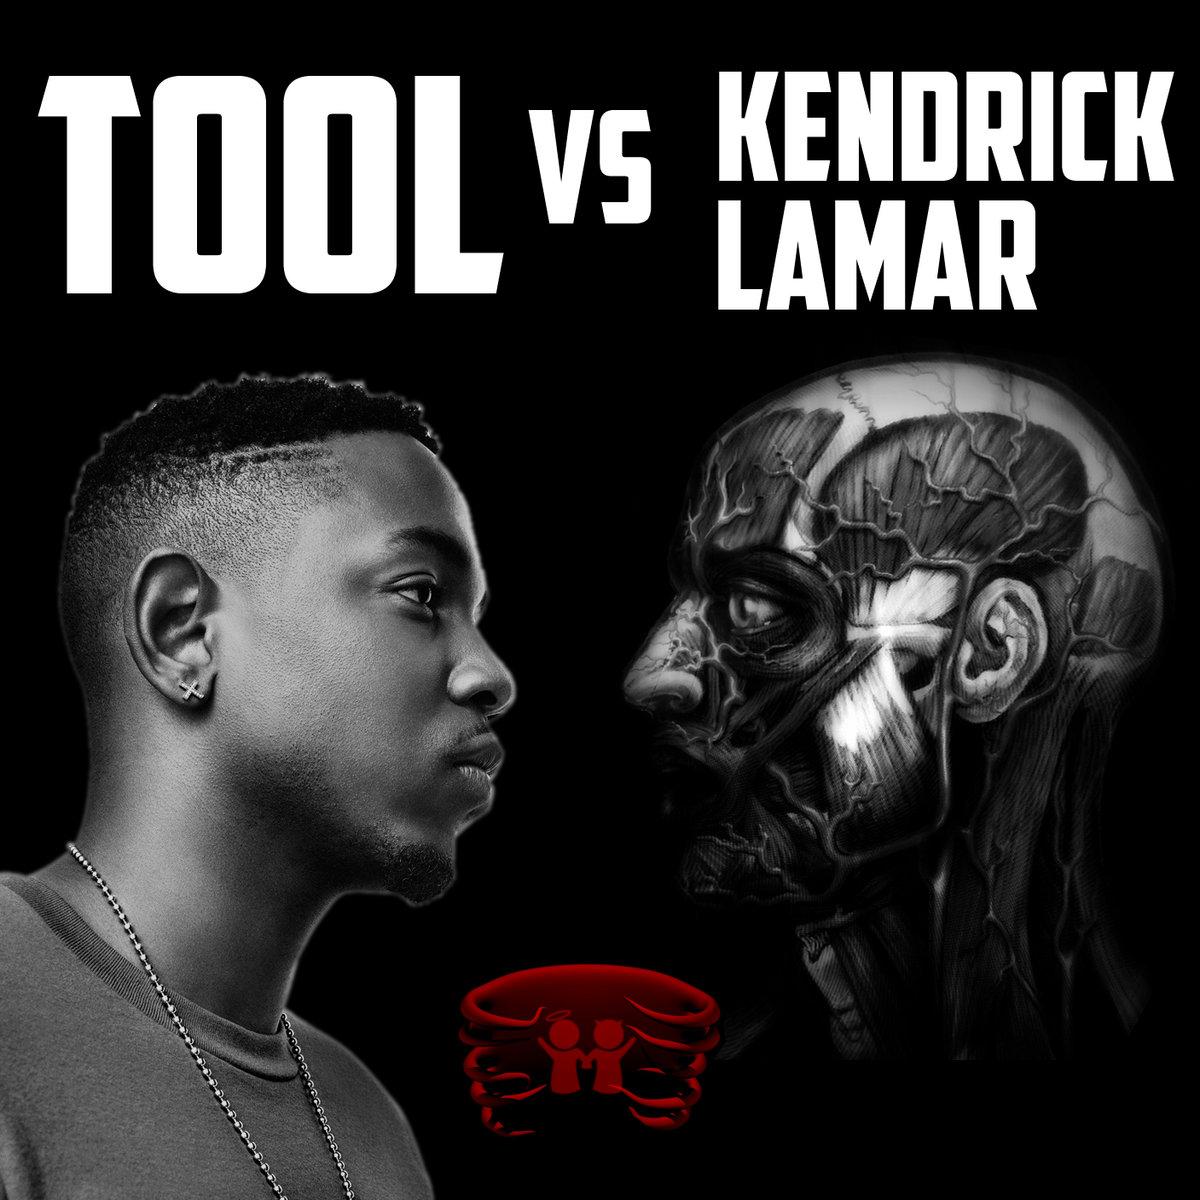 Tool vs kendrick lamar sober swimming pools drank - Kendrick lamar swimming pools radio edit ...